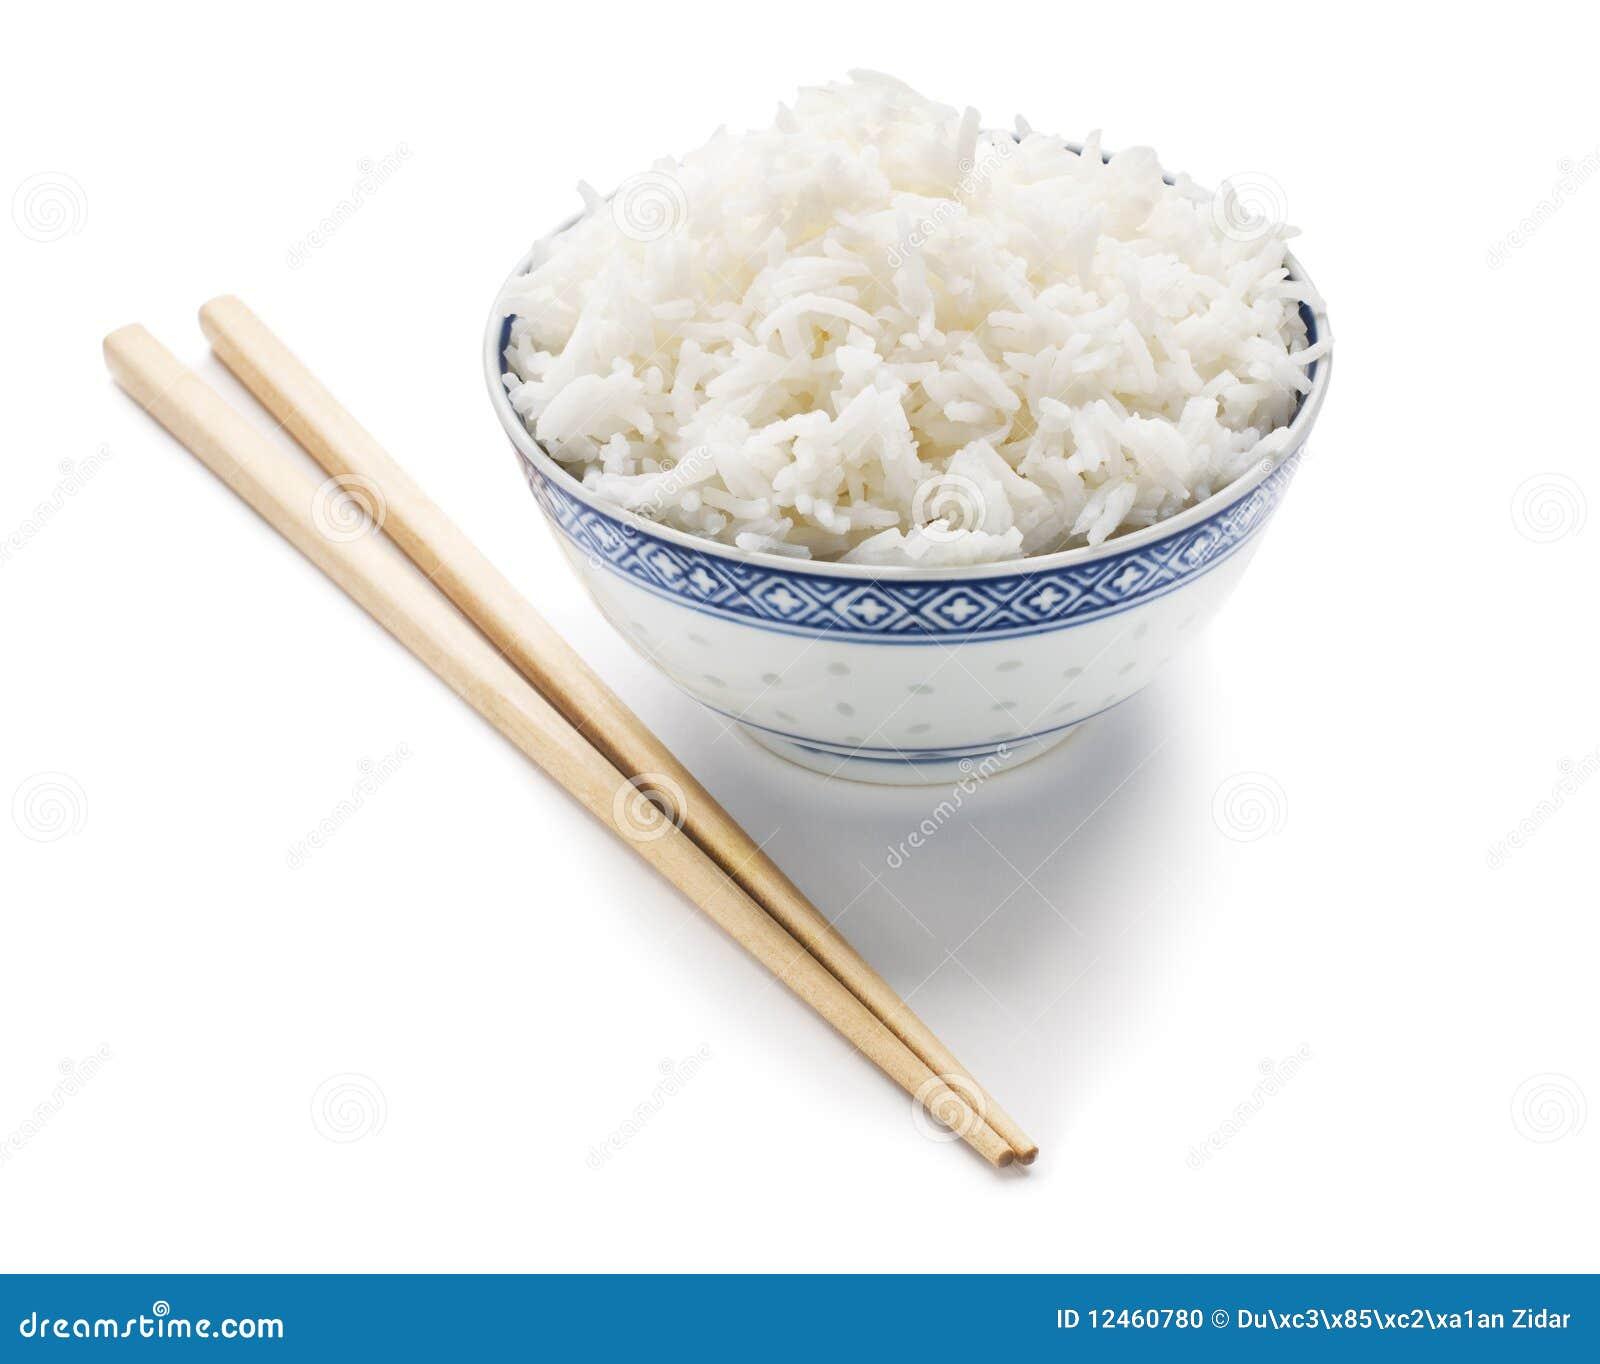 Rice Stock Photo - Image: 12460780